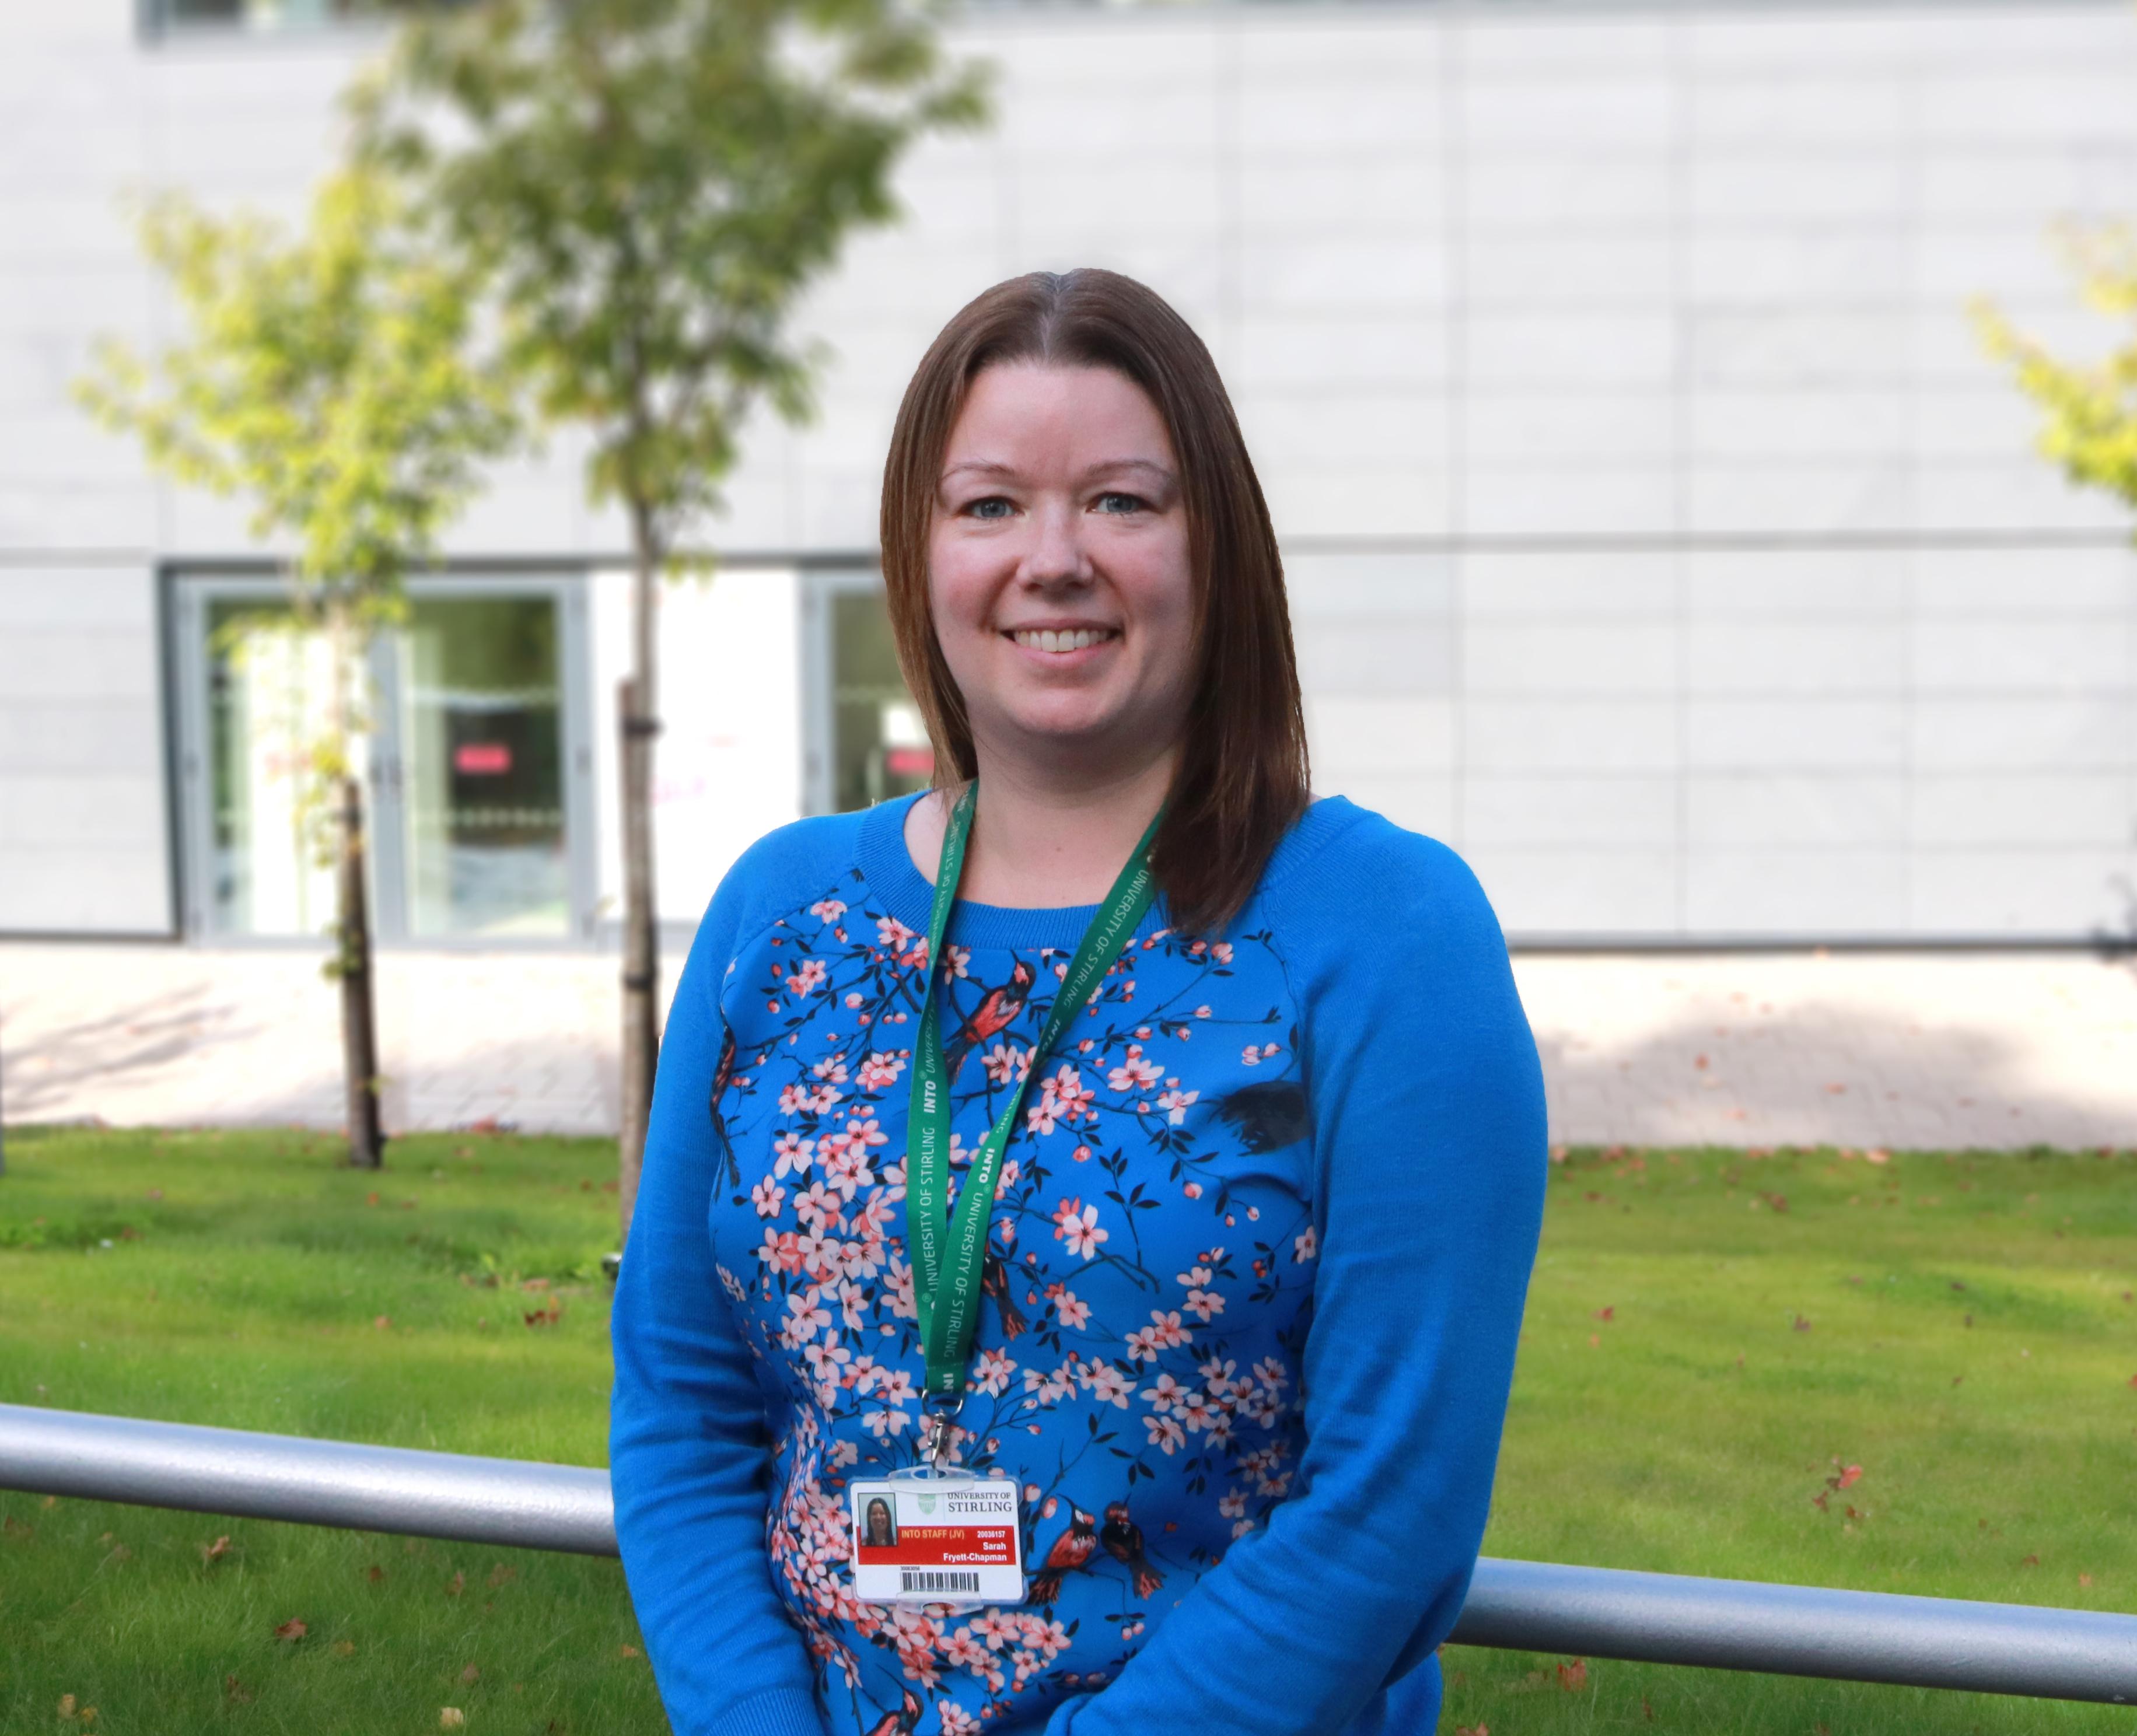 Image of INTO Stirling teacher, Sarah